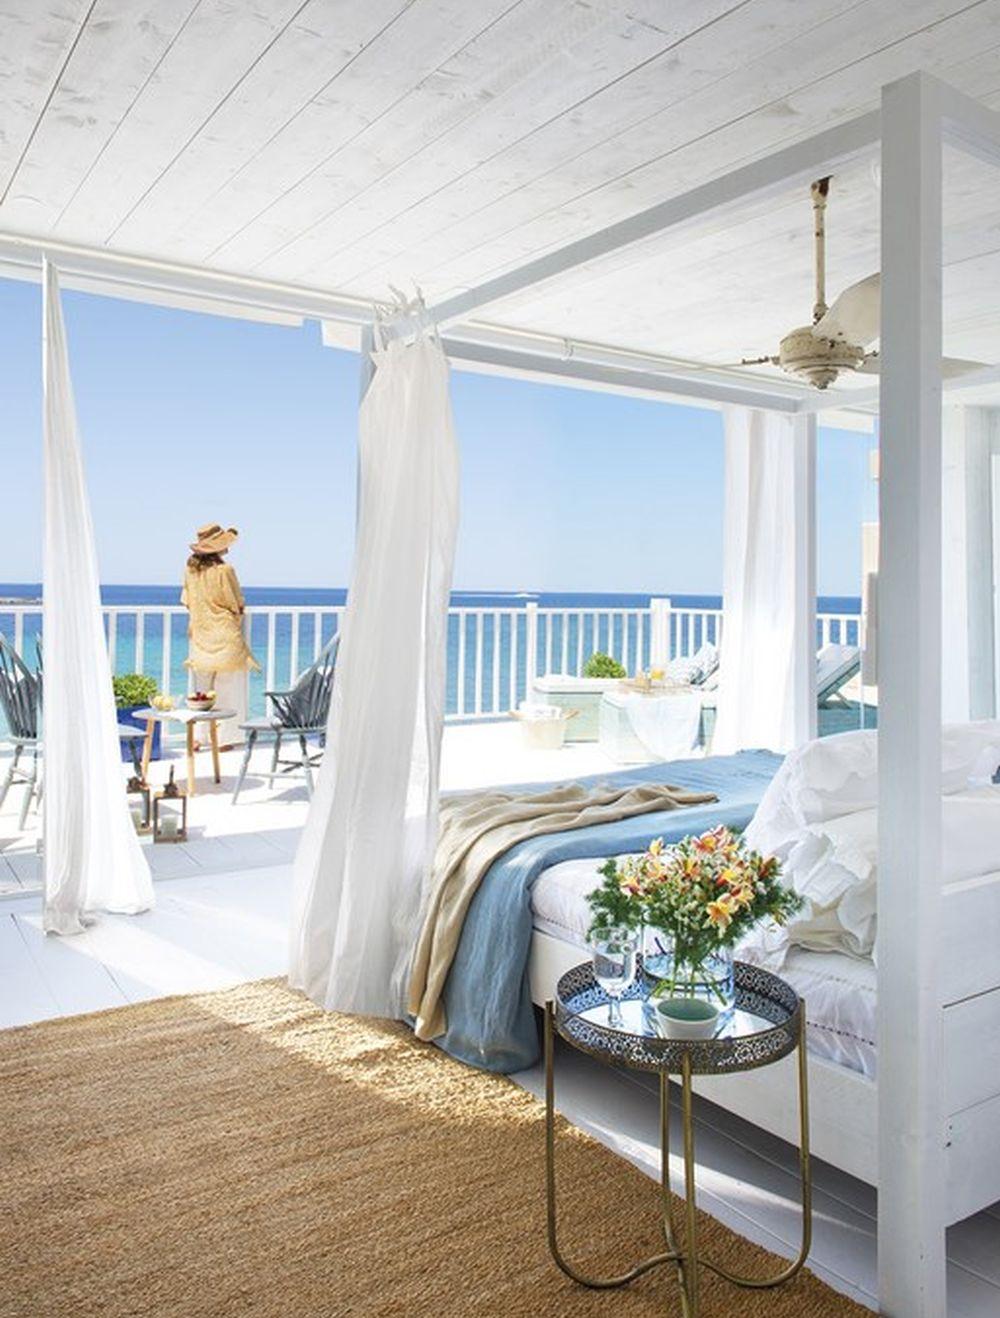 adelaparvu.com despre casa pescareasca modernizata in Mallorca, designer Catalina Socias, Foto ElMueble Stella Rotger (14)